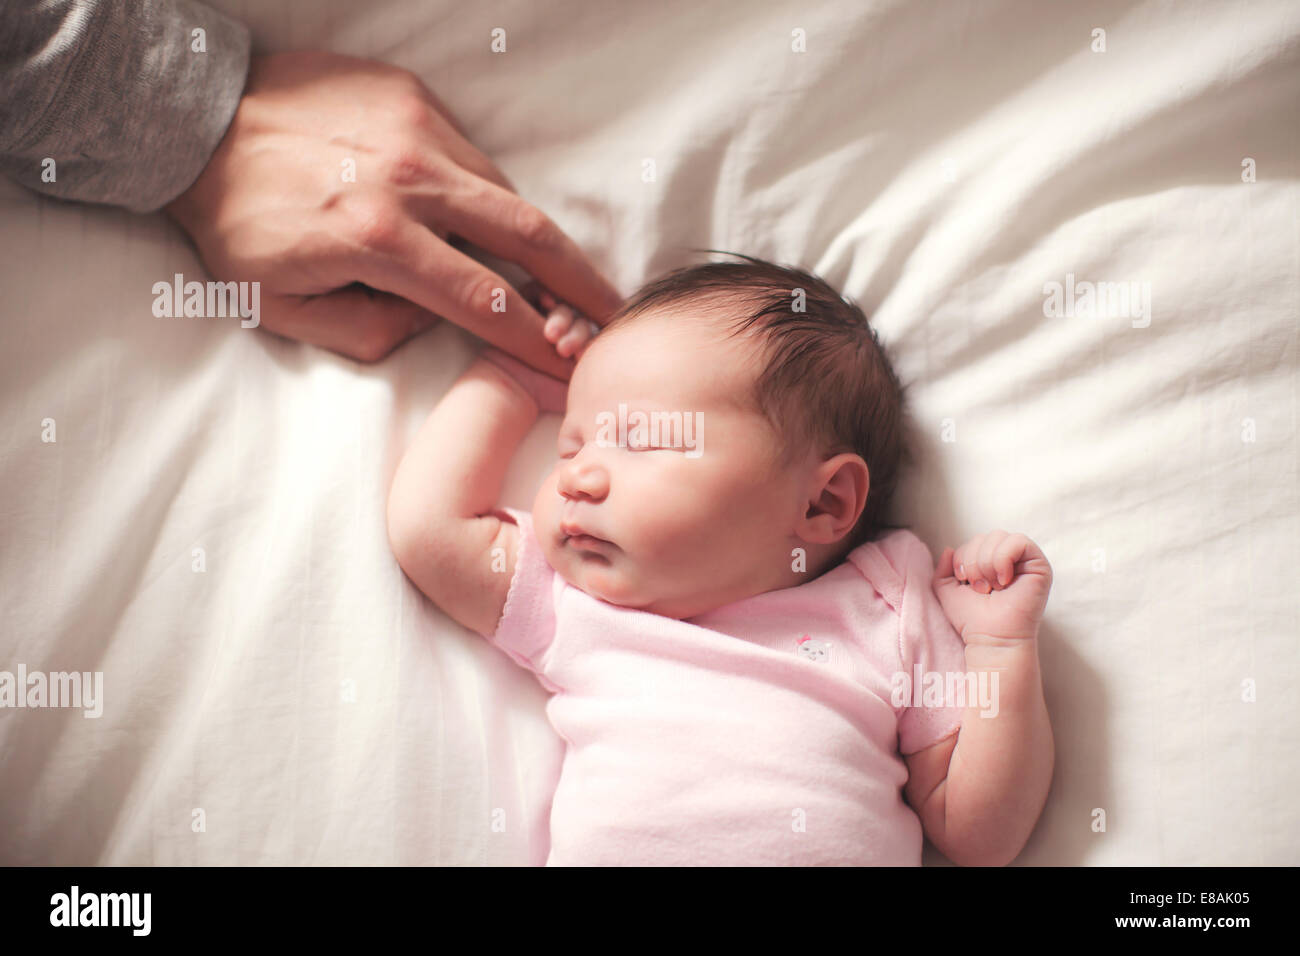 Niña dormida, manos celebrada por el p. Imagen De Stock